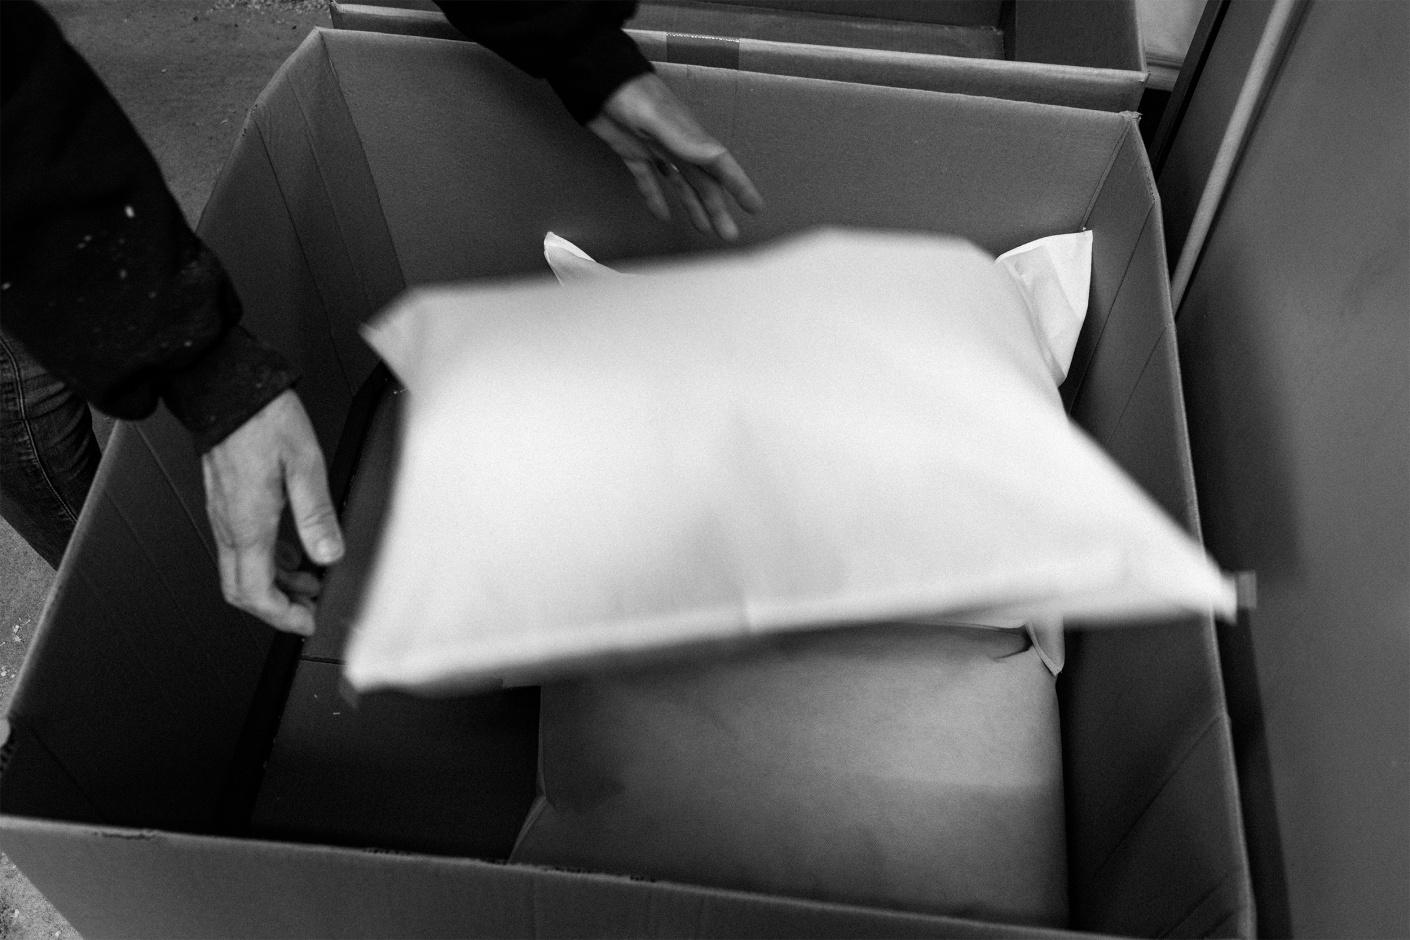 11 | De Kistenfabriek | CORONA | Jelle Pieter de Boer | 2020